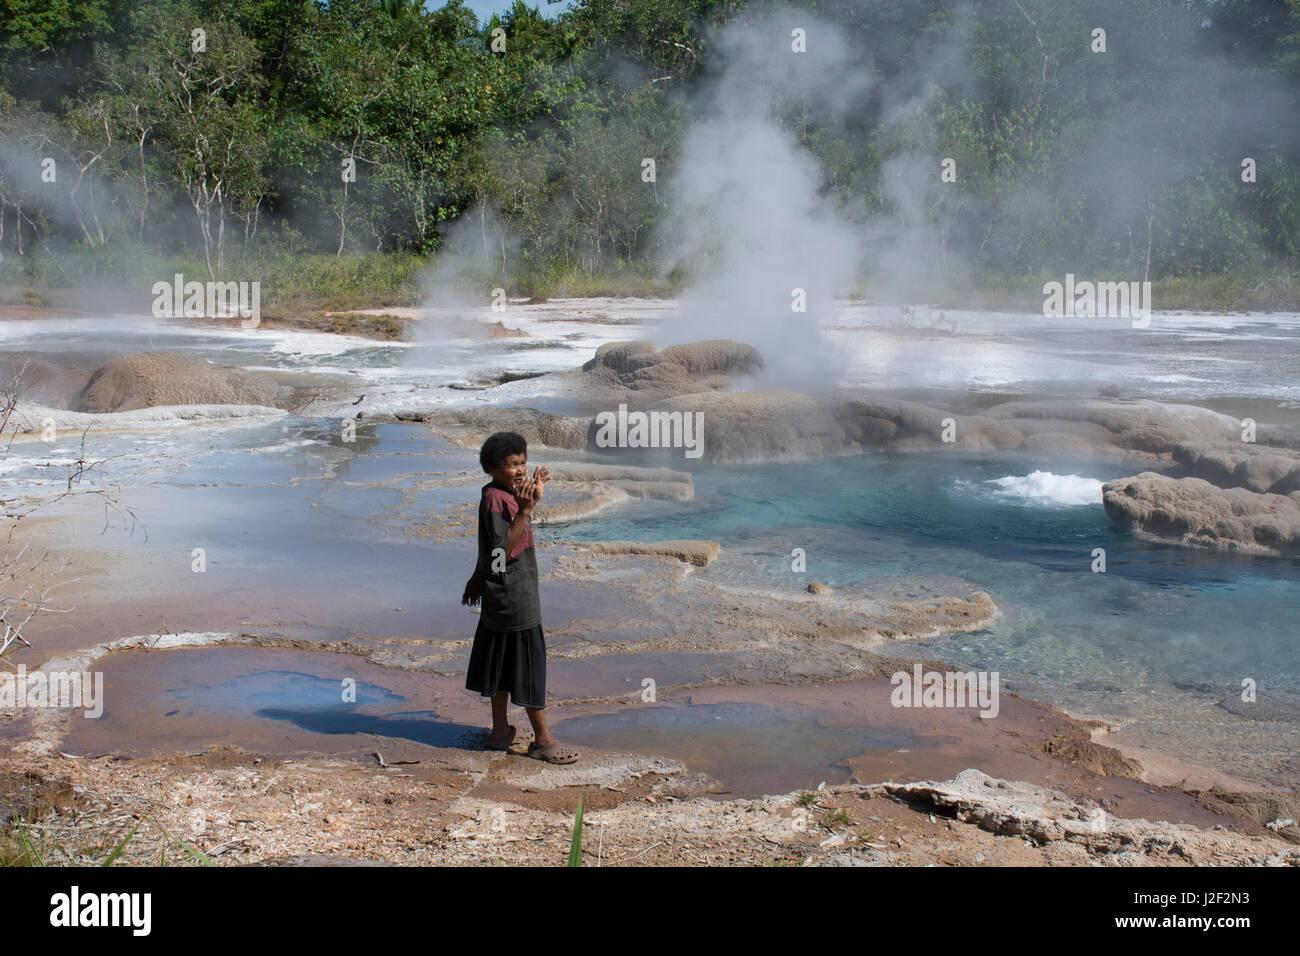 Melanesia, Papua New Guinea, Fergusson Island, Del Hot Springs. Volcanic hot springs. Local woman who 'calls' - Stock Image